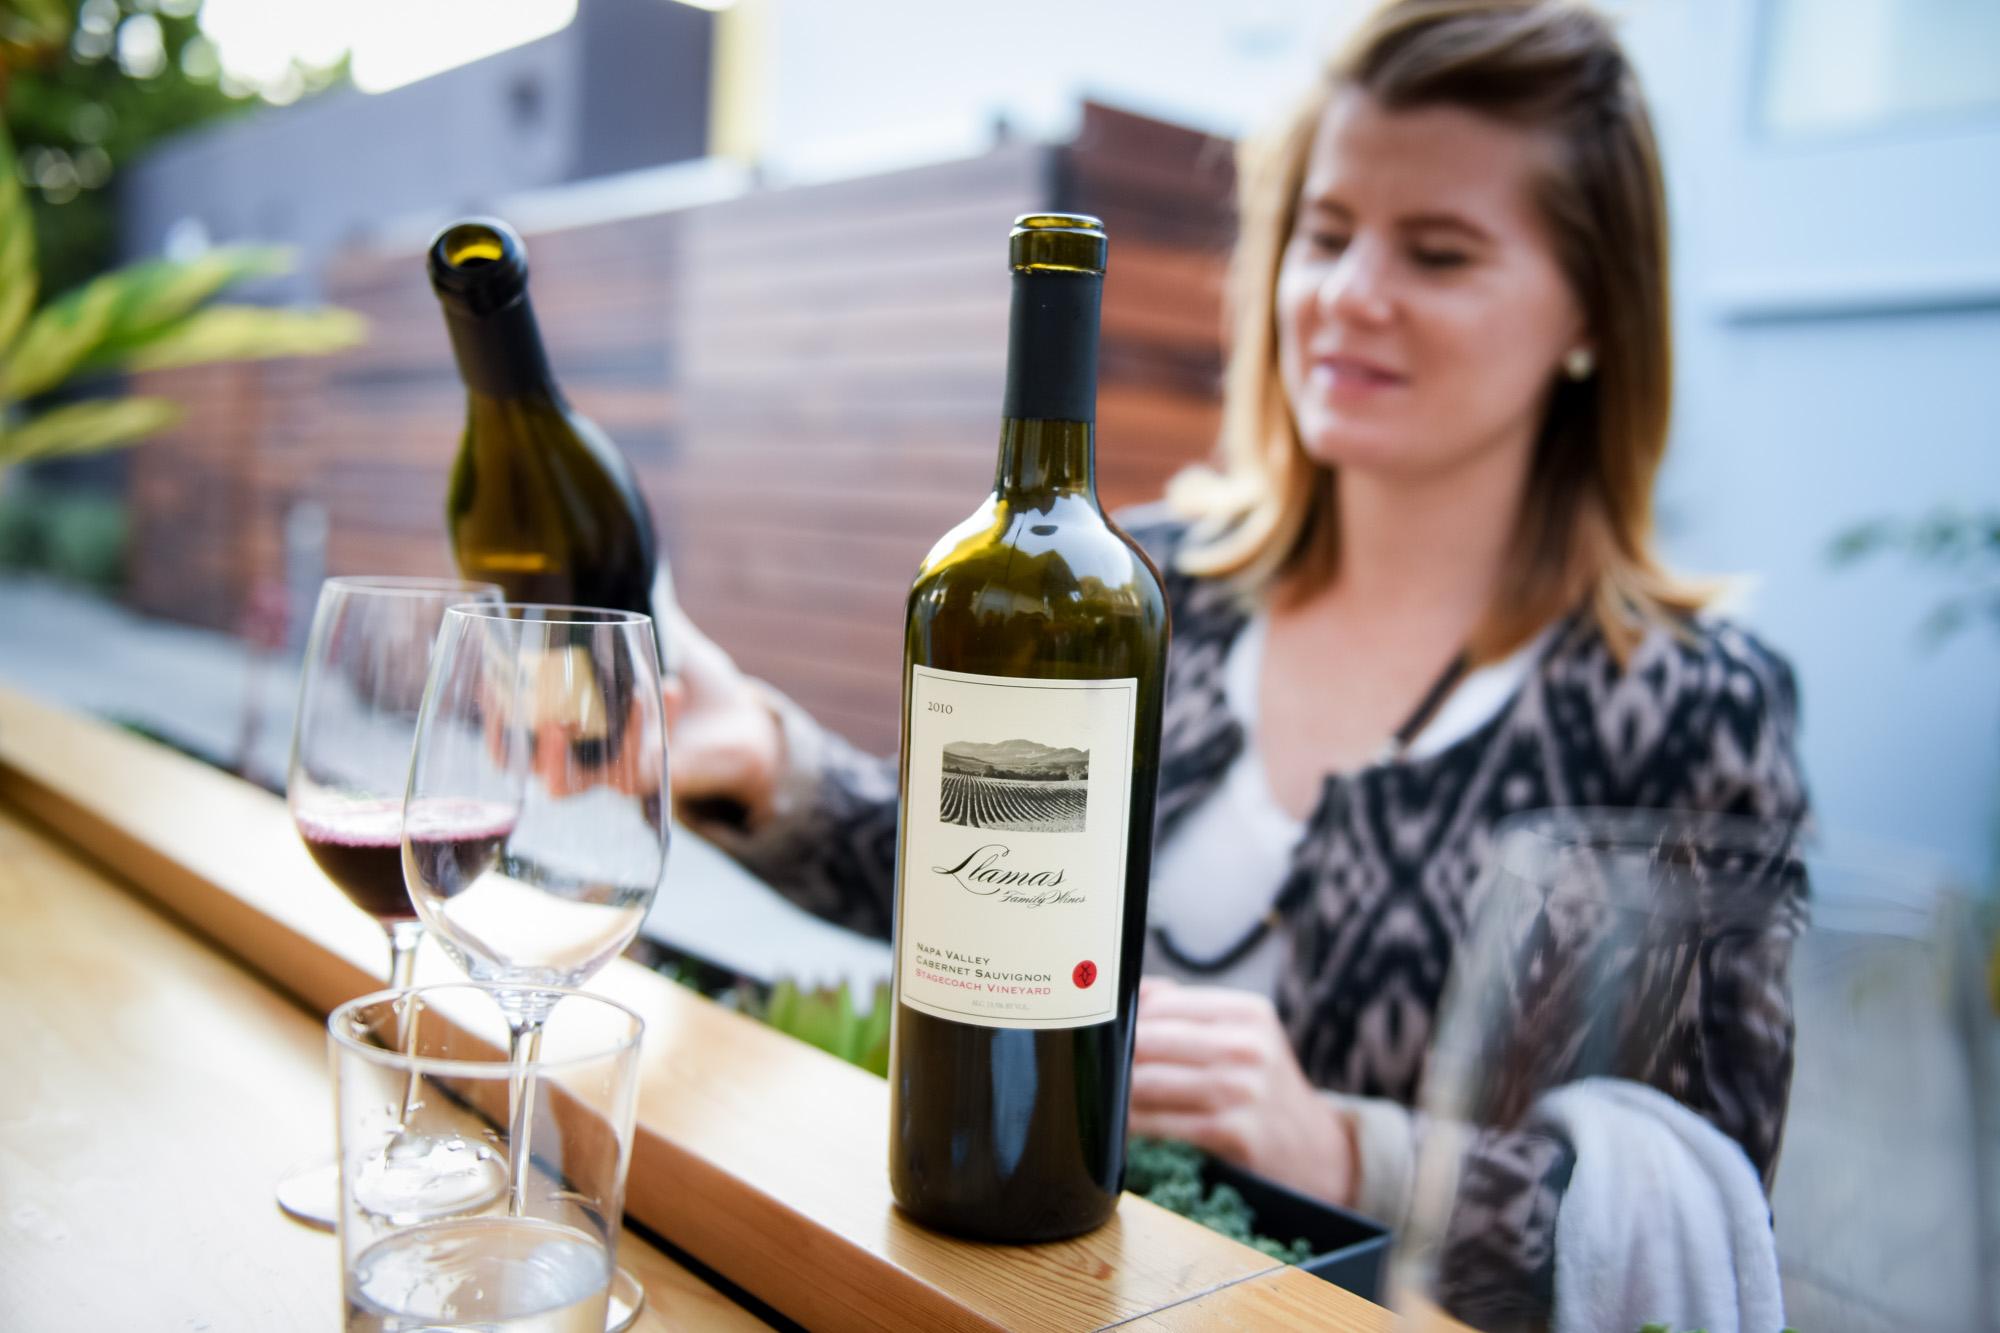 Llamas Wine Tasting | Cadet Beer + Wine Bar, Napa, California